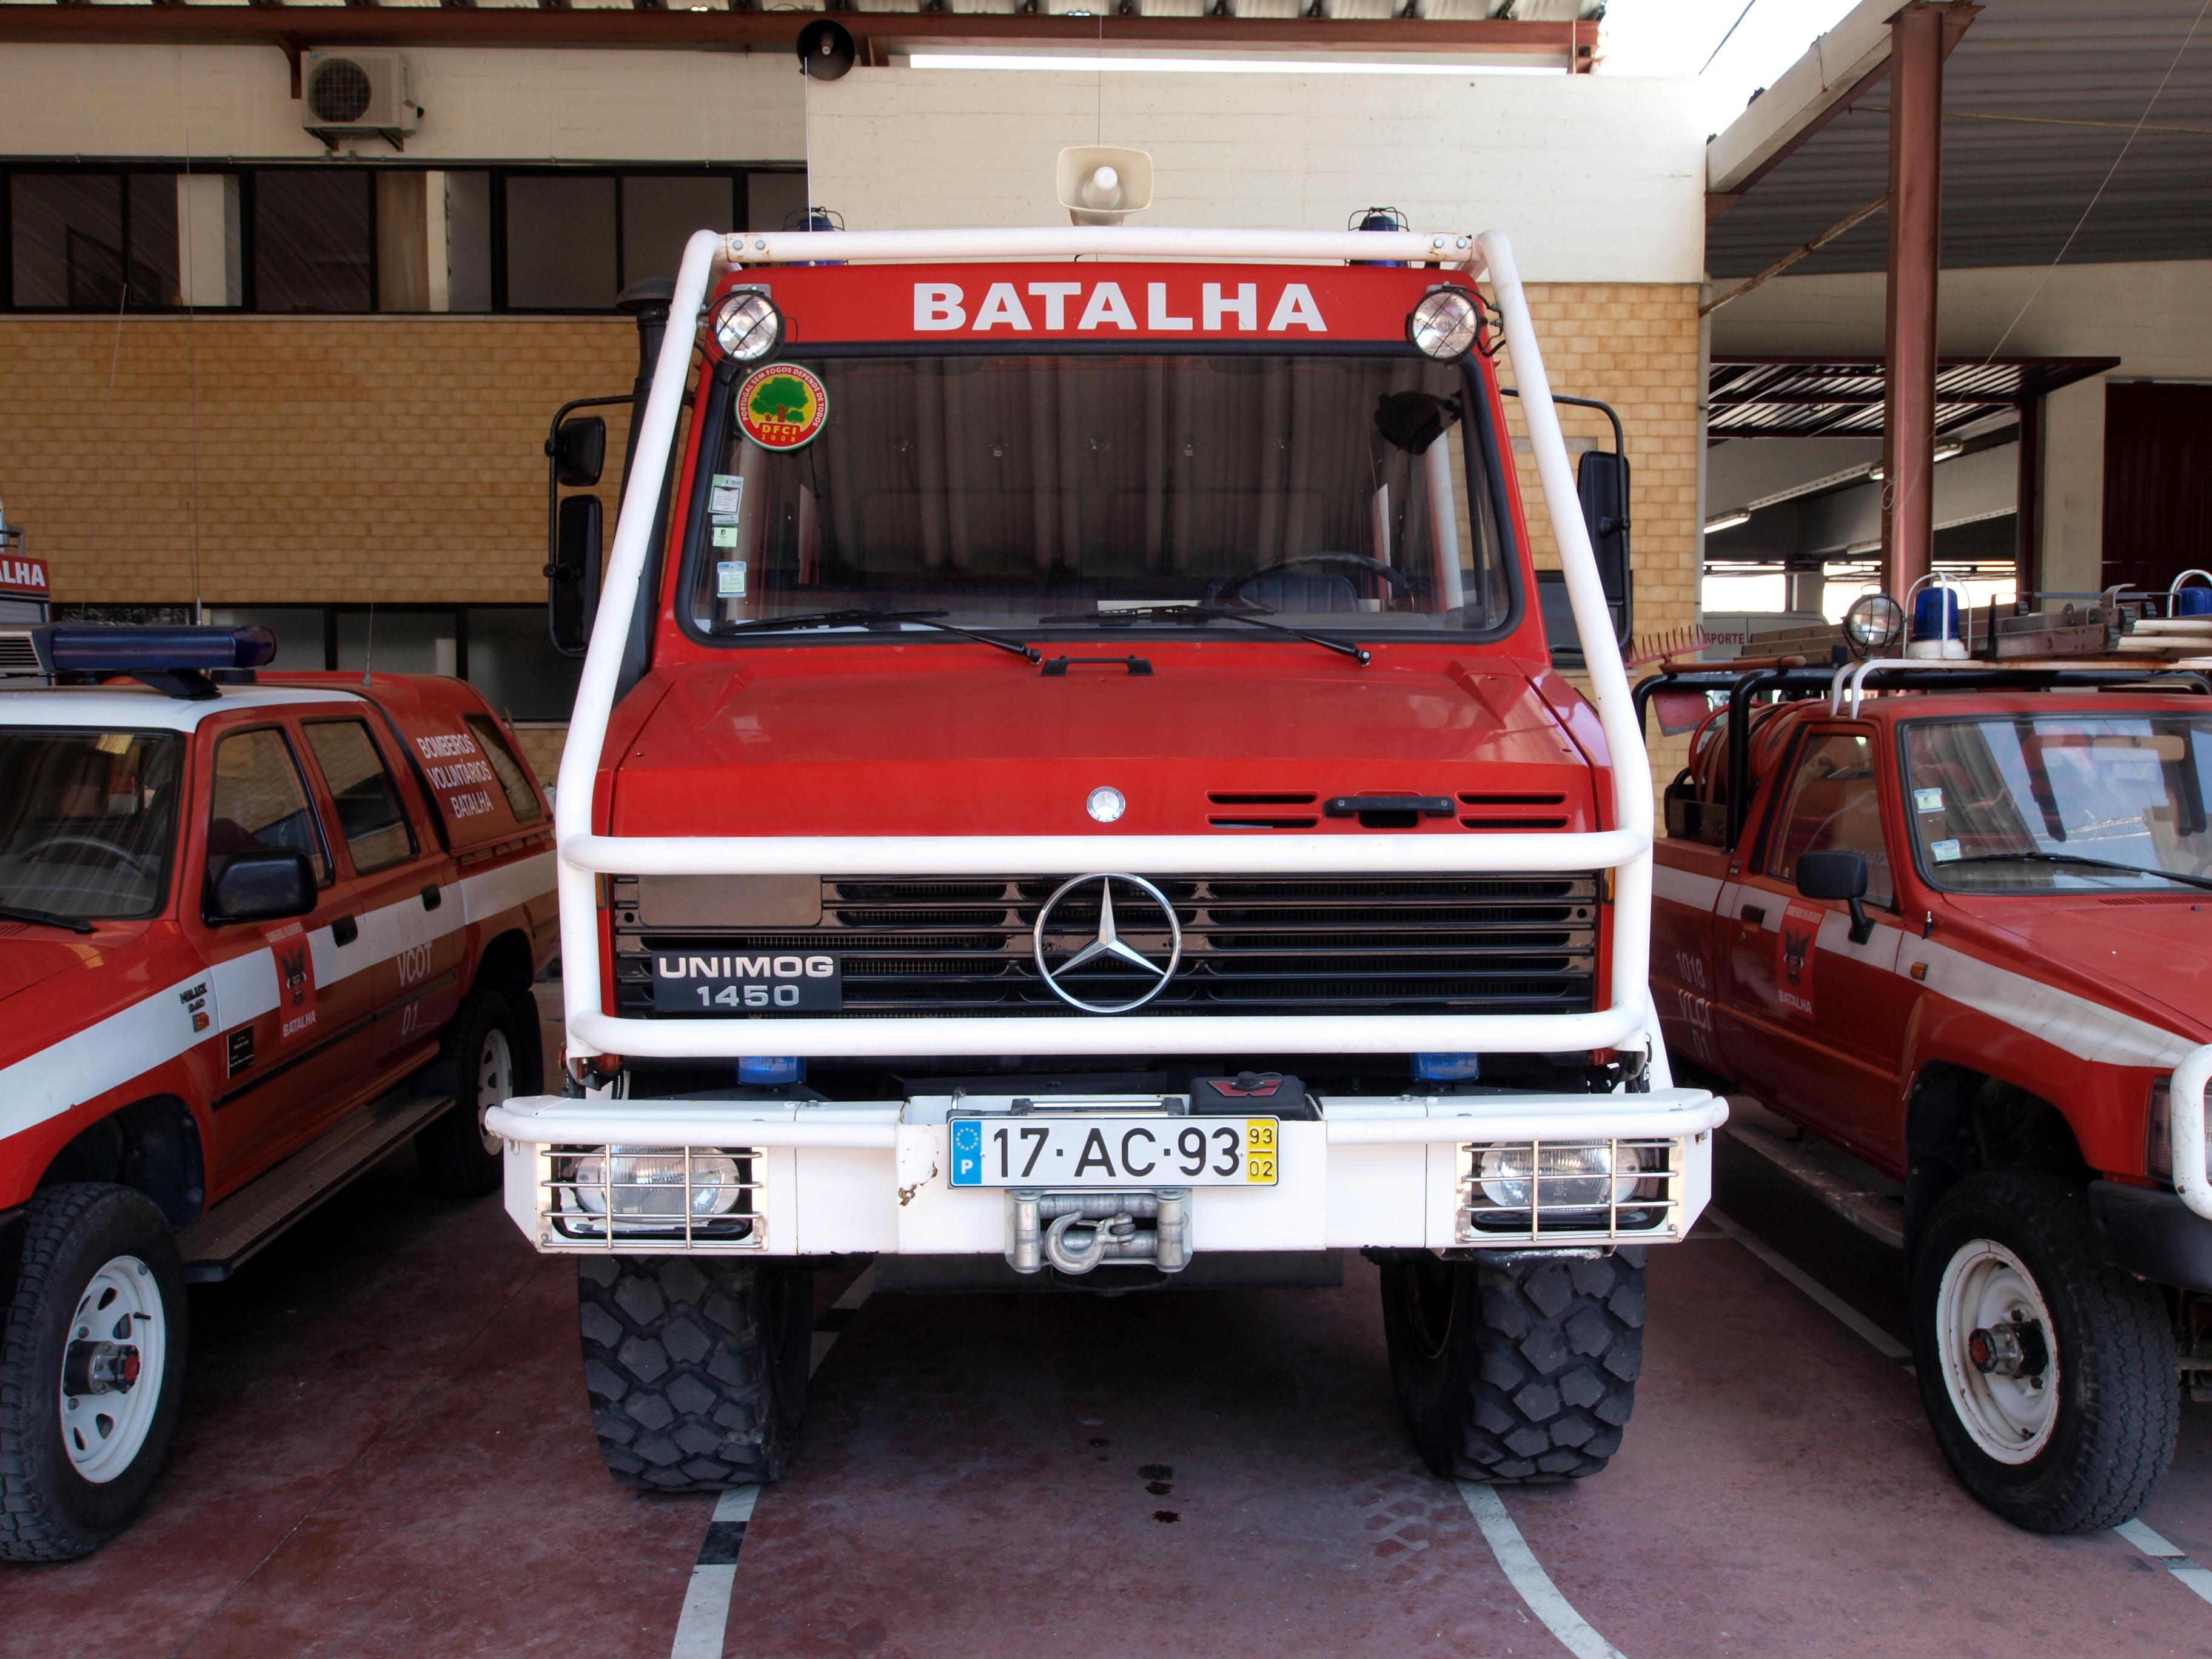 File:Mercedes Unimog 1450, Bombeiros Batalha, Unit 1018 VFCI 06 pic2.JPG